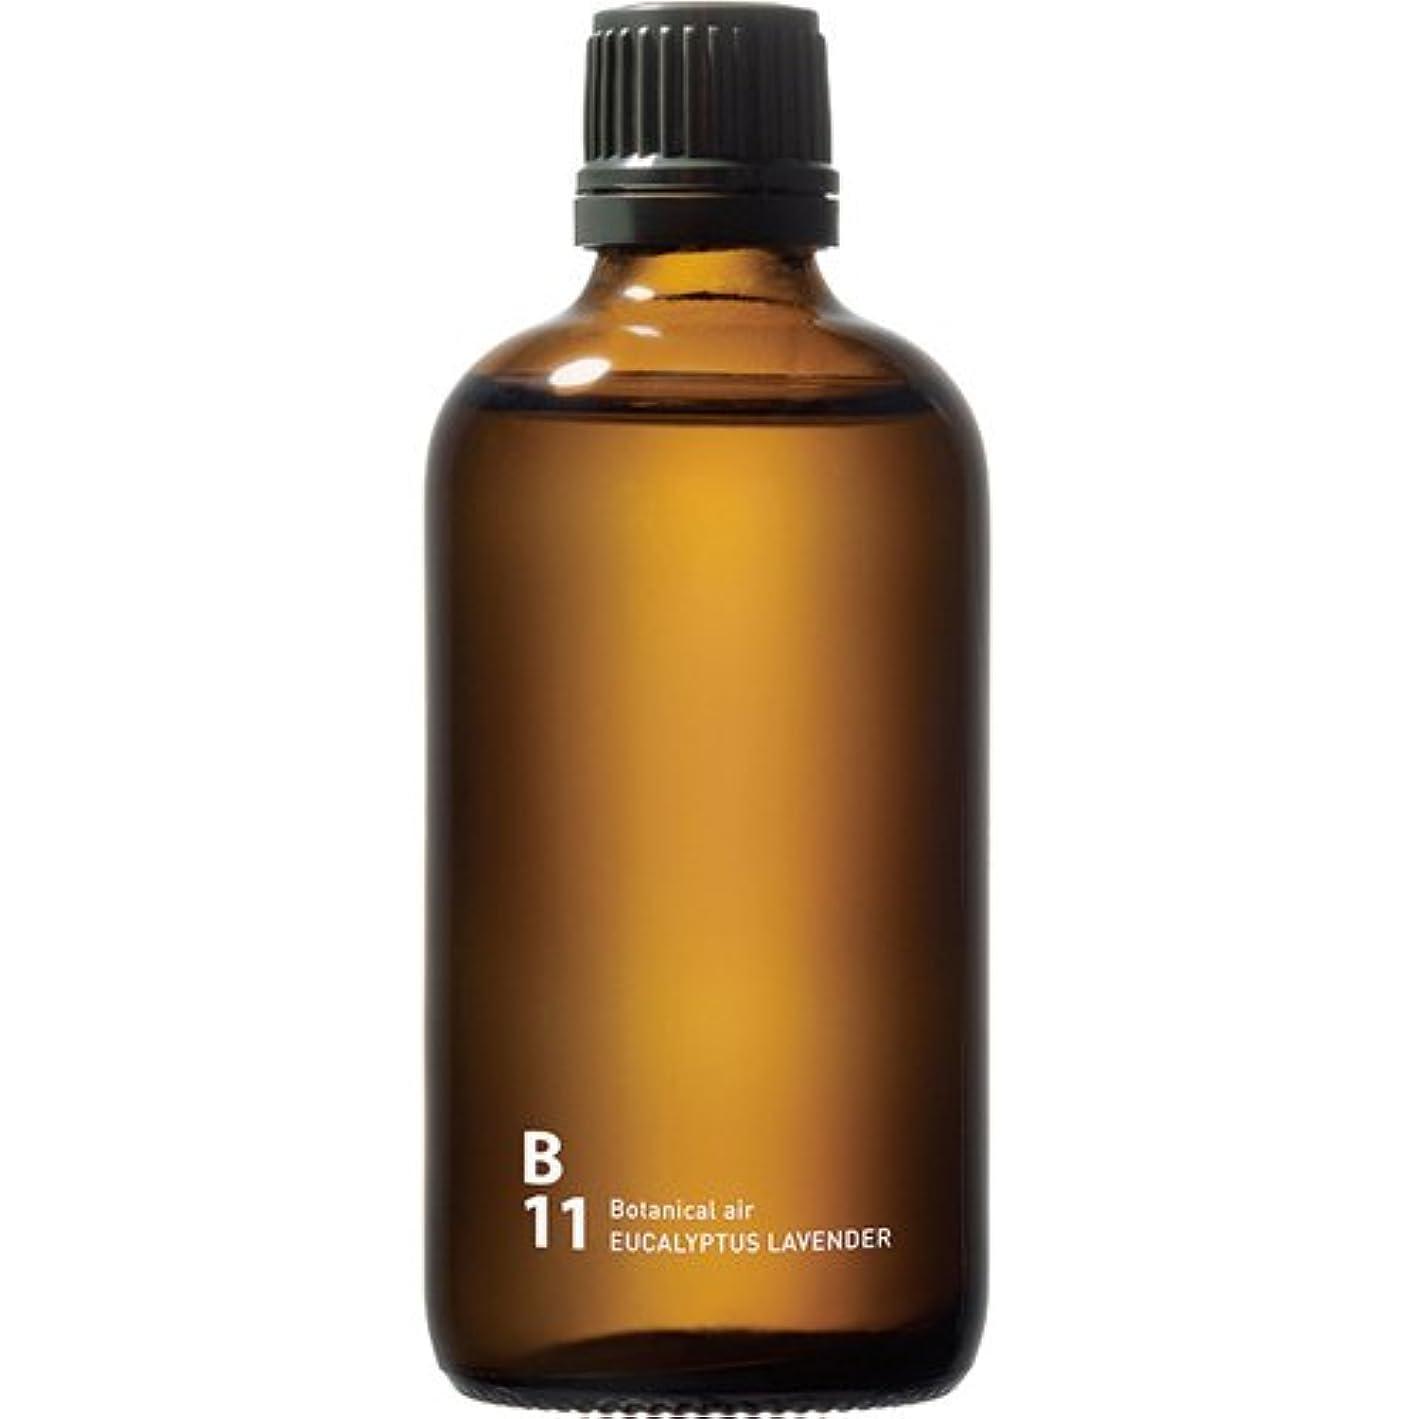 細い先駆者耐久B11 EUCALYPTUS LAVENDER piezo aroma oil 100ml